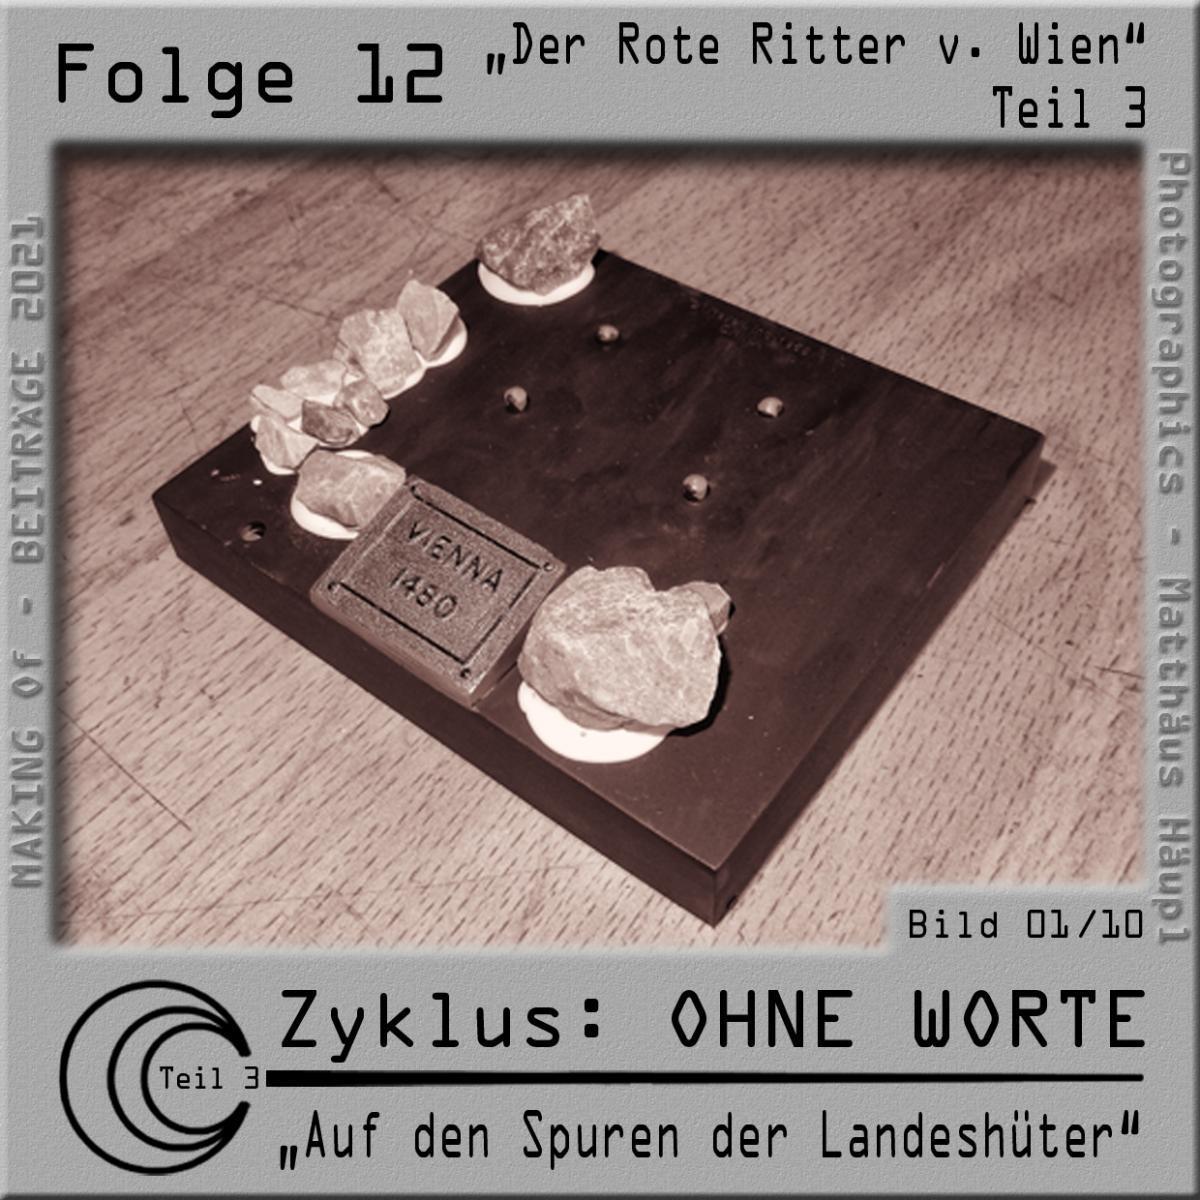 Folge-12 Der-Rote-Ritter Teil-3-01